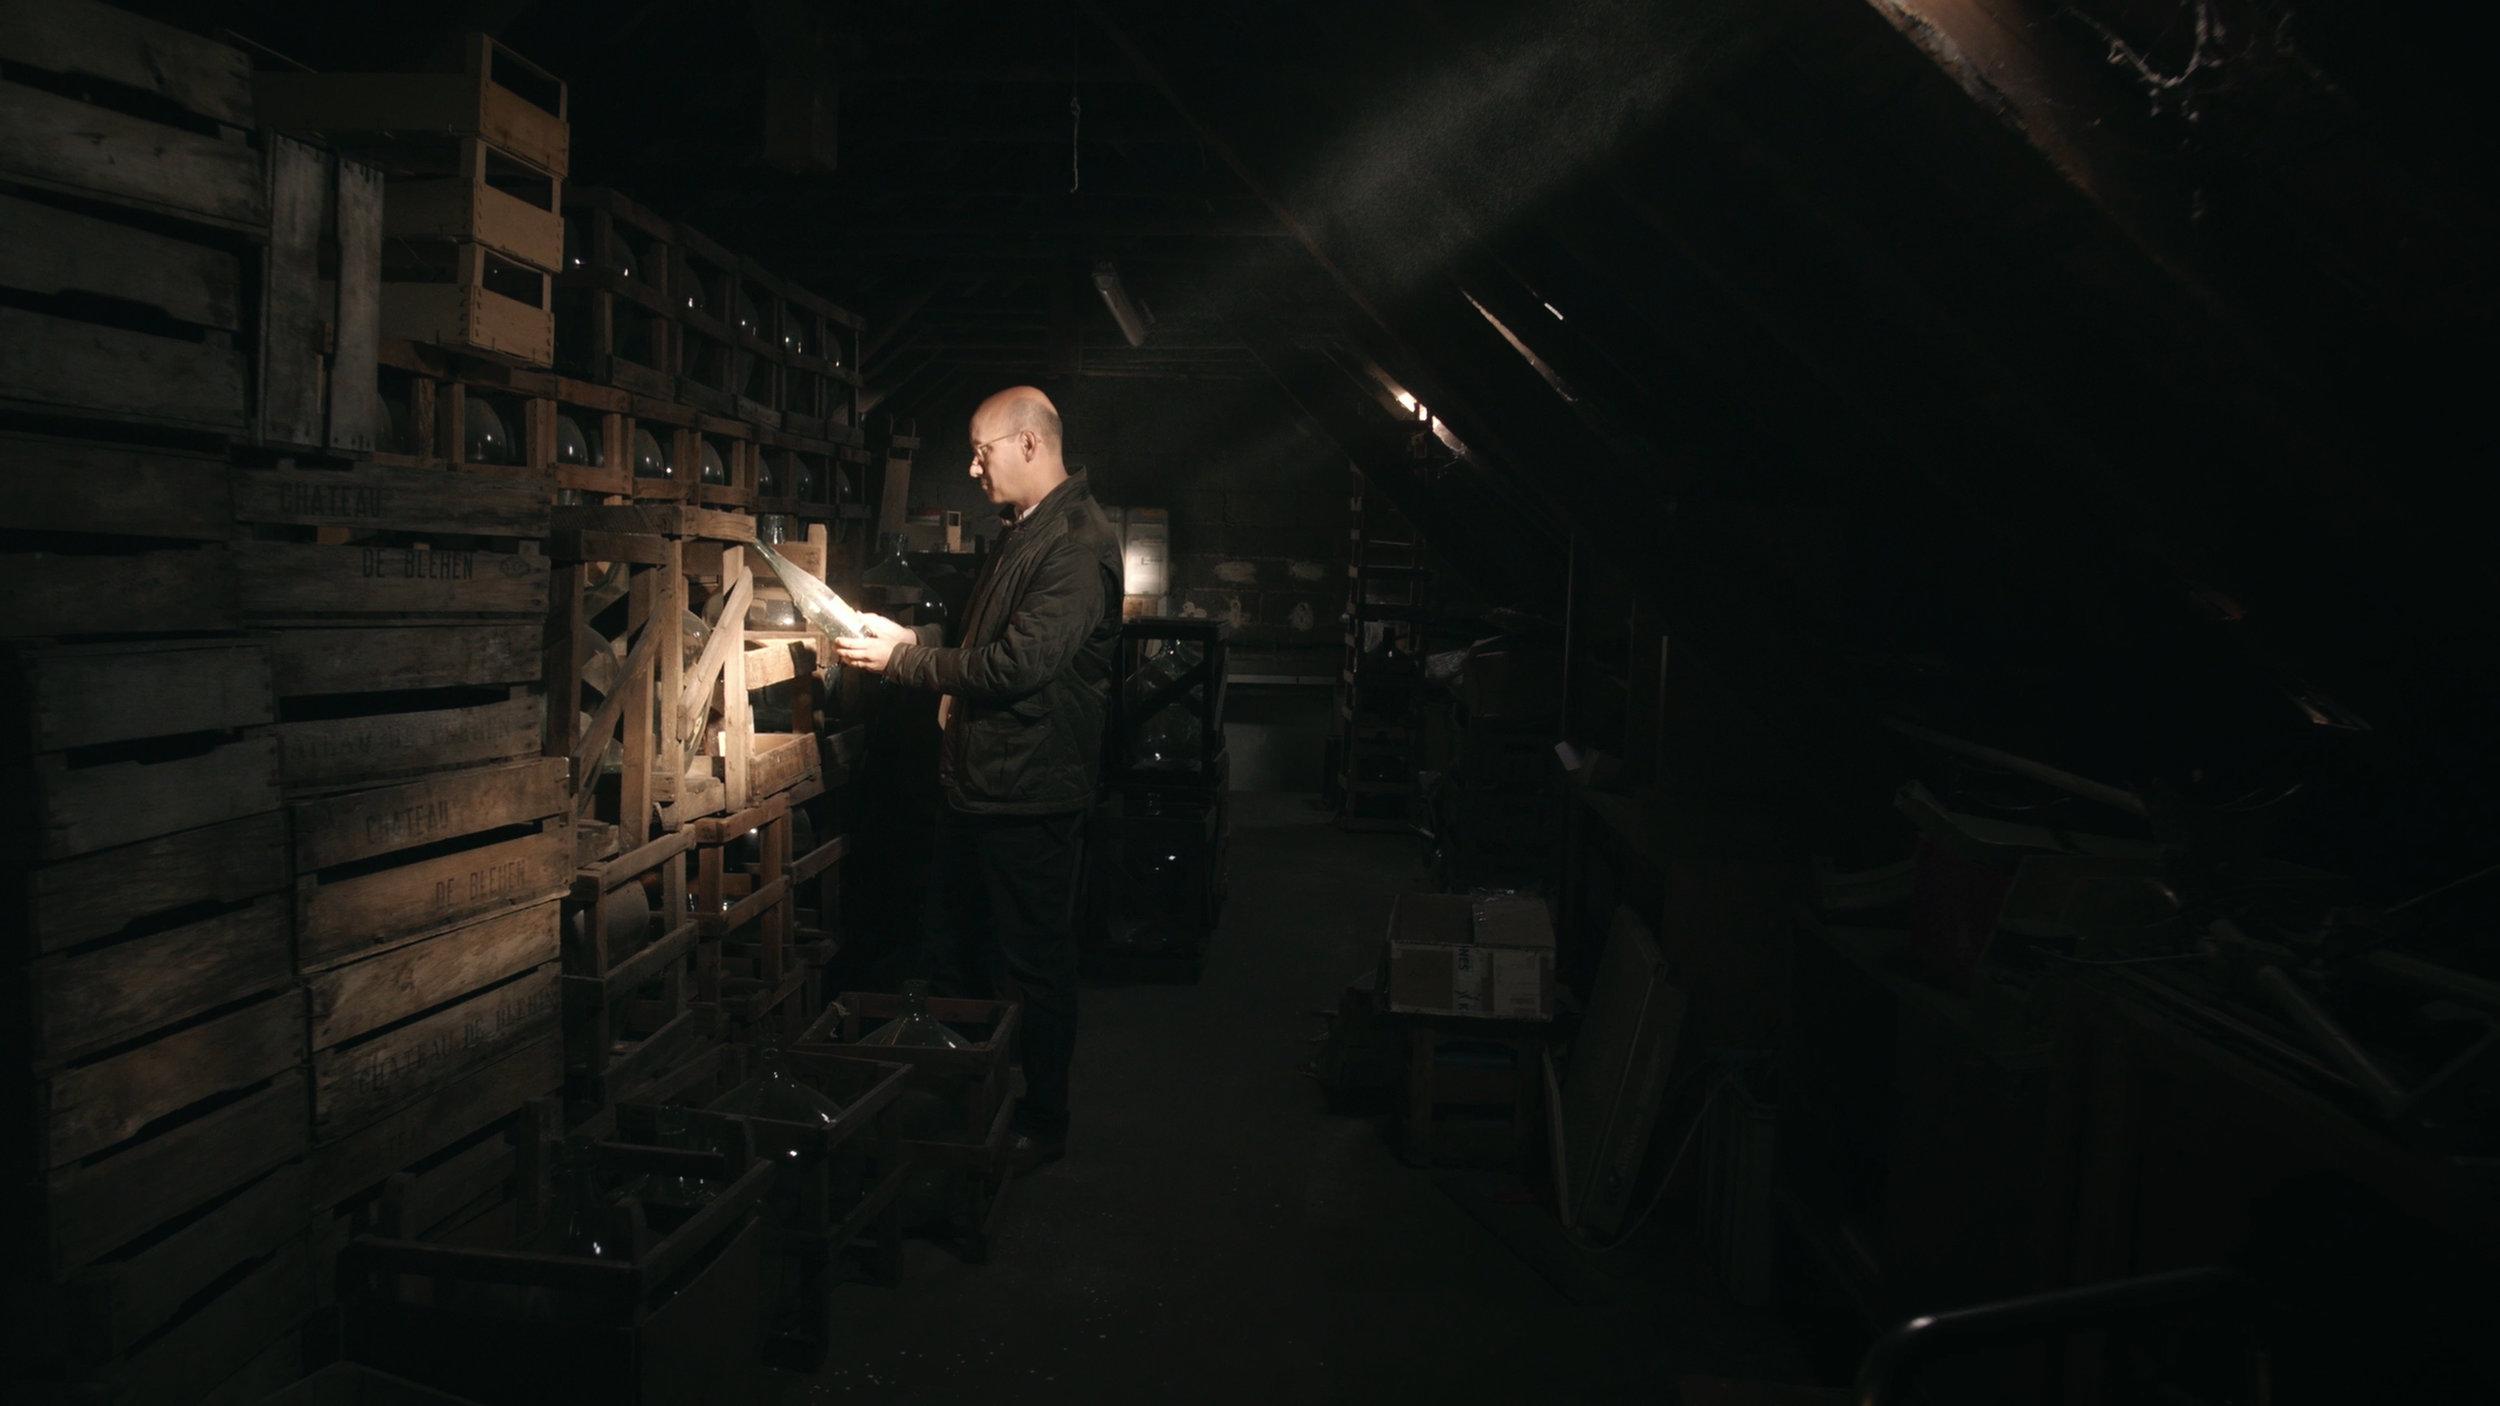 el-flamingo-film-produktion-düsseldorf-director-van-nahmen-4